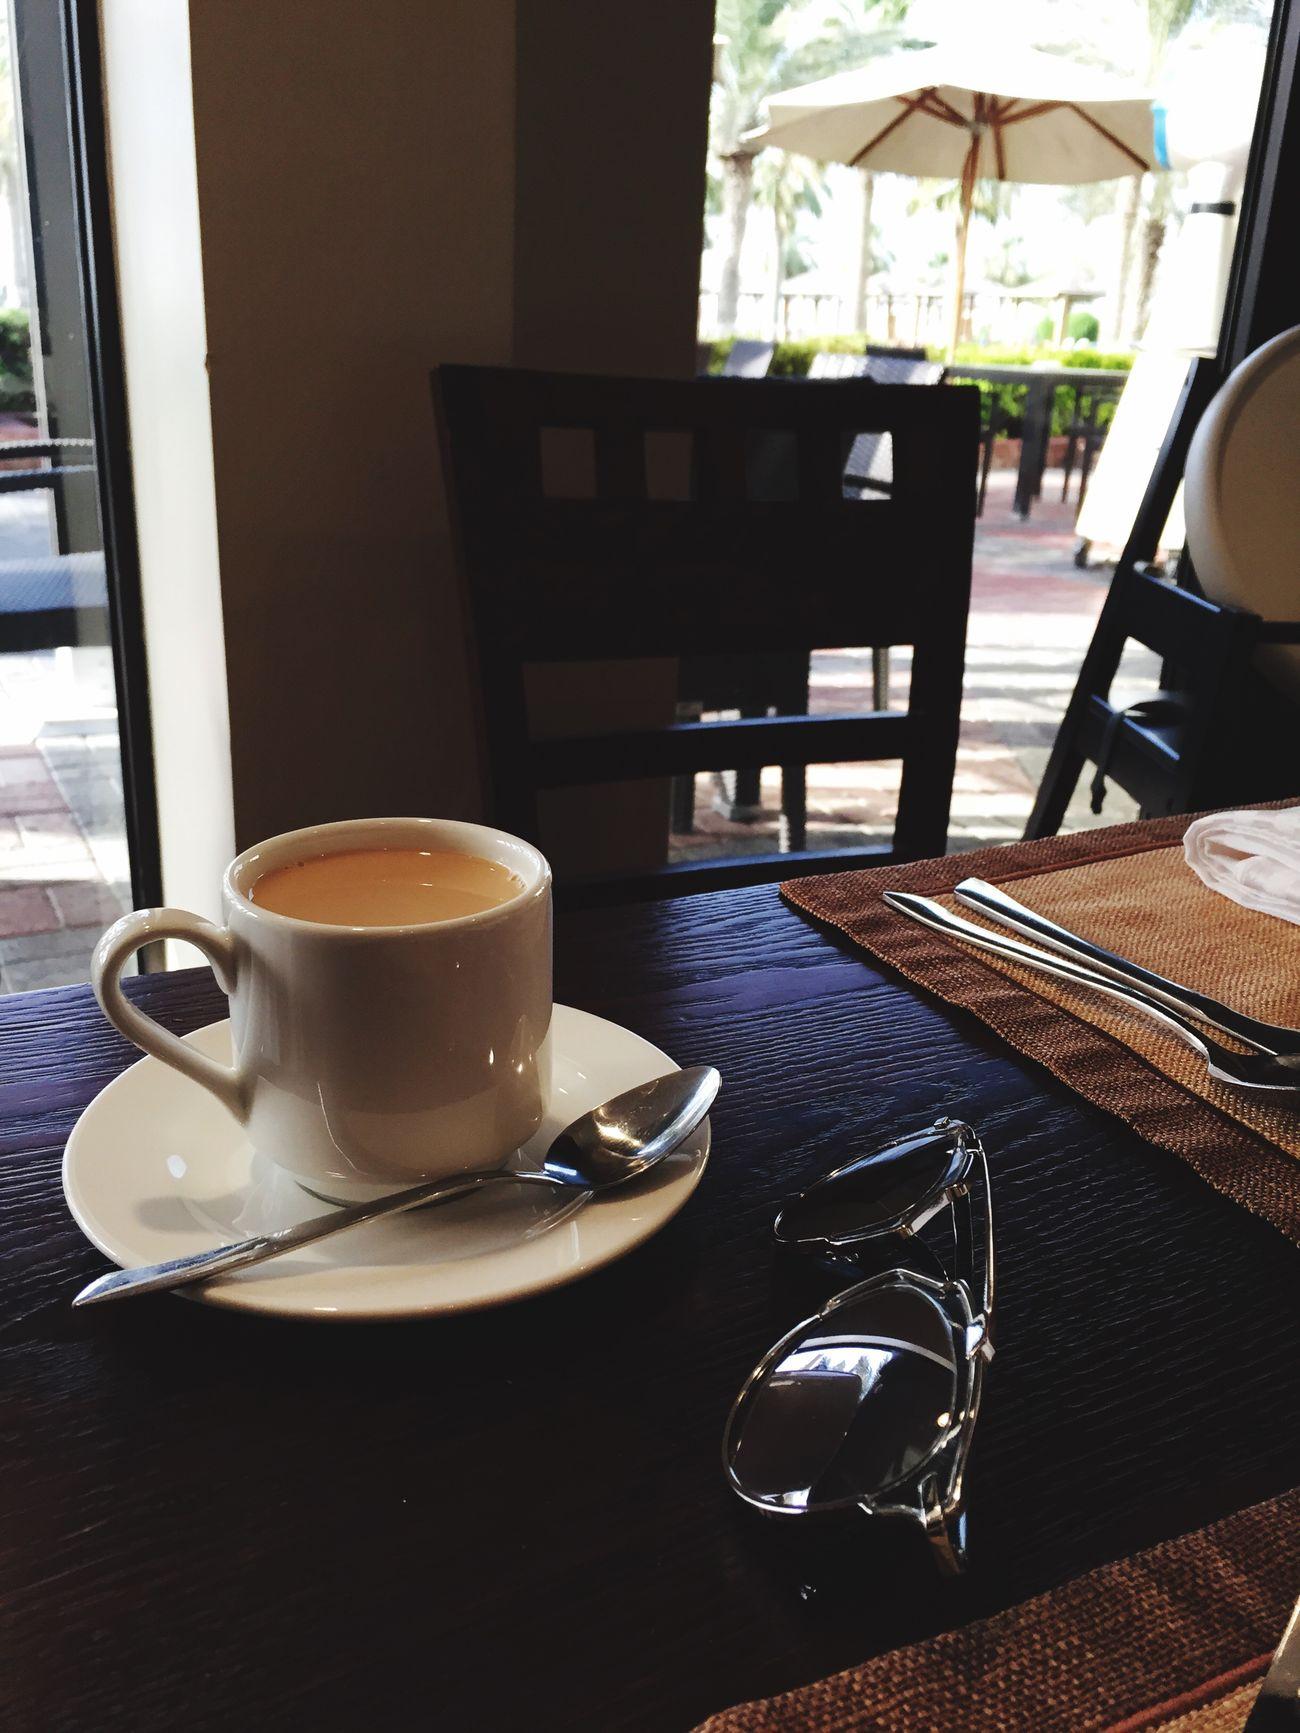 Dior Soreal Eyewear Sunglass  Tea Milk Teawithmilk Morning